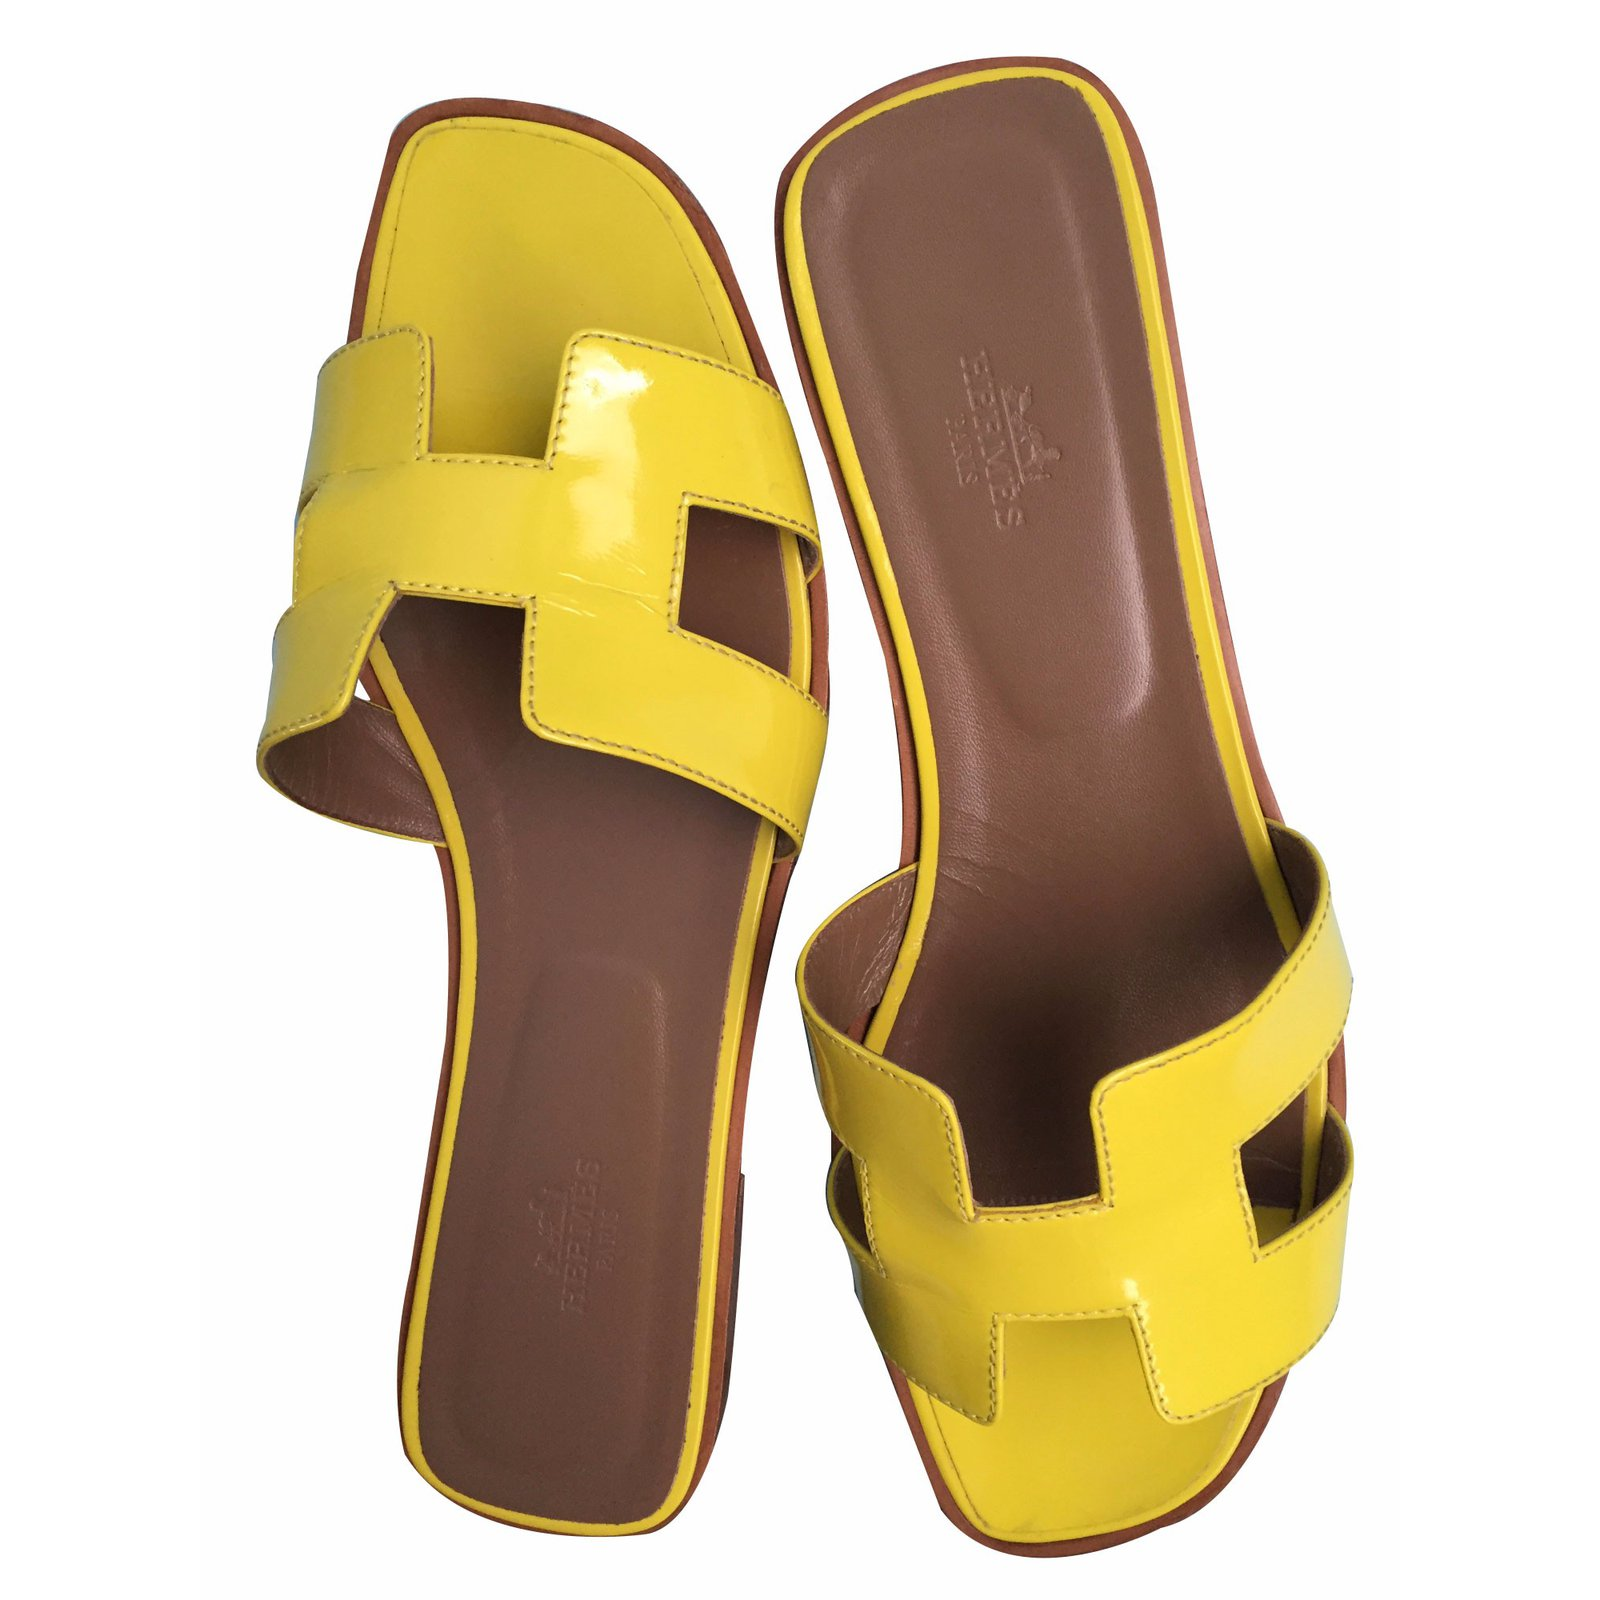 a04470698c32 Hermès Oran Vernis fluo Sandals Patent leather Yellow ref.16713 ...